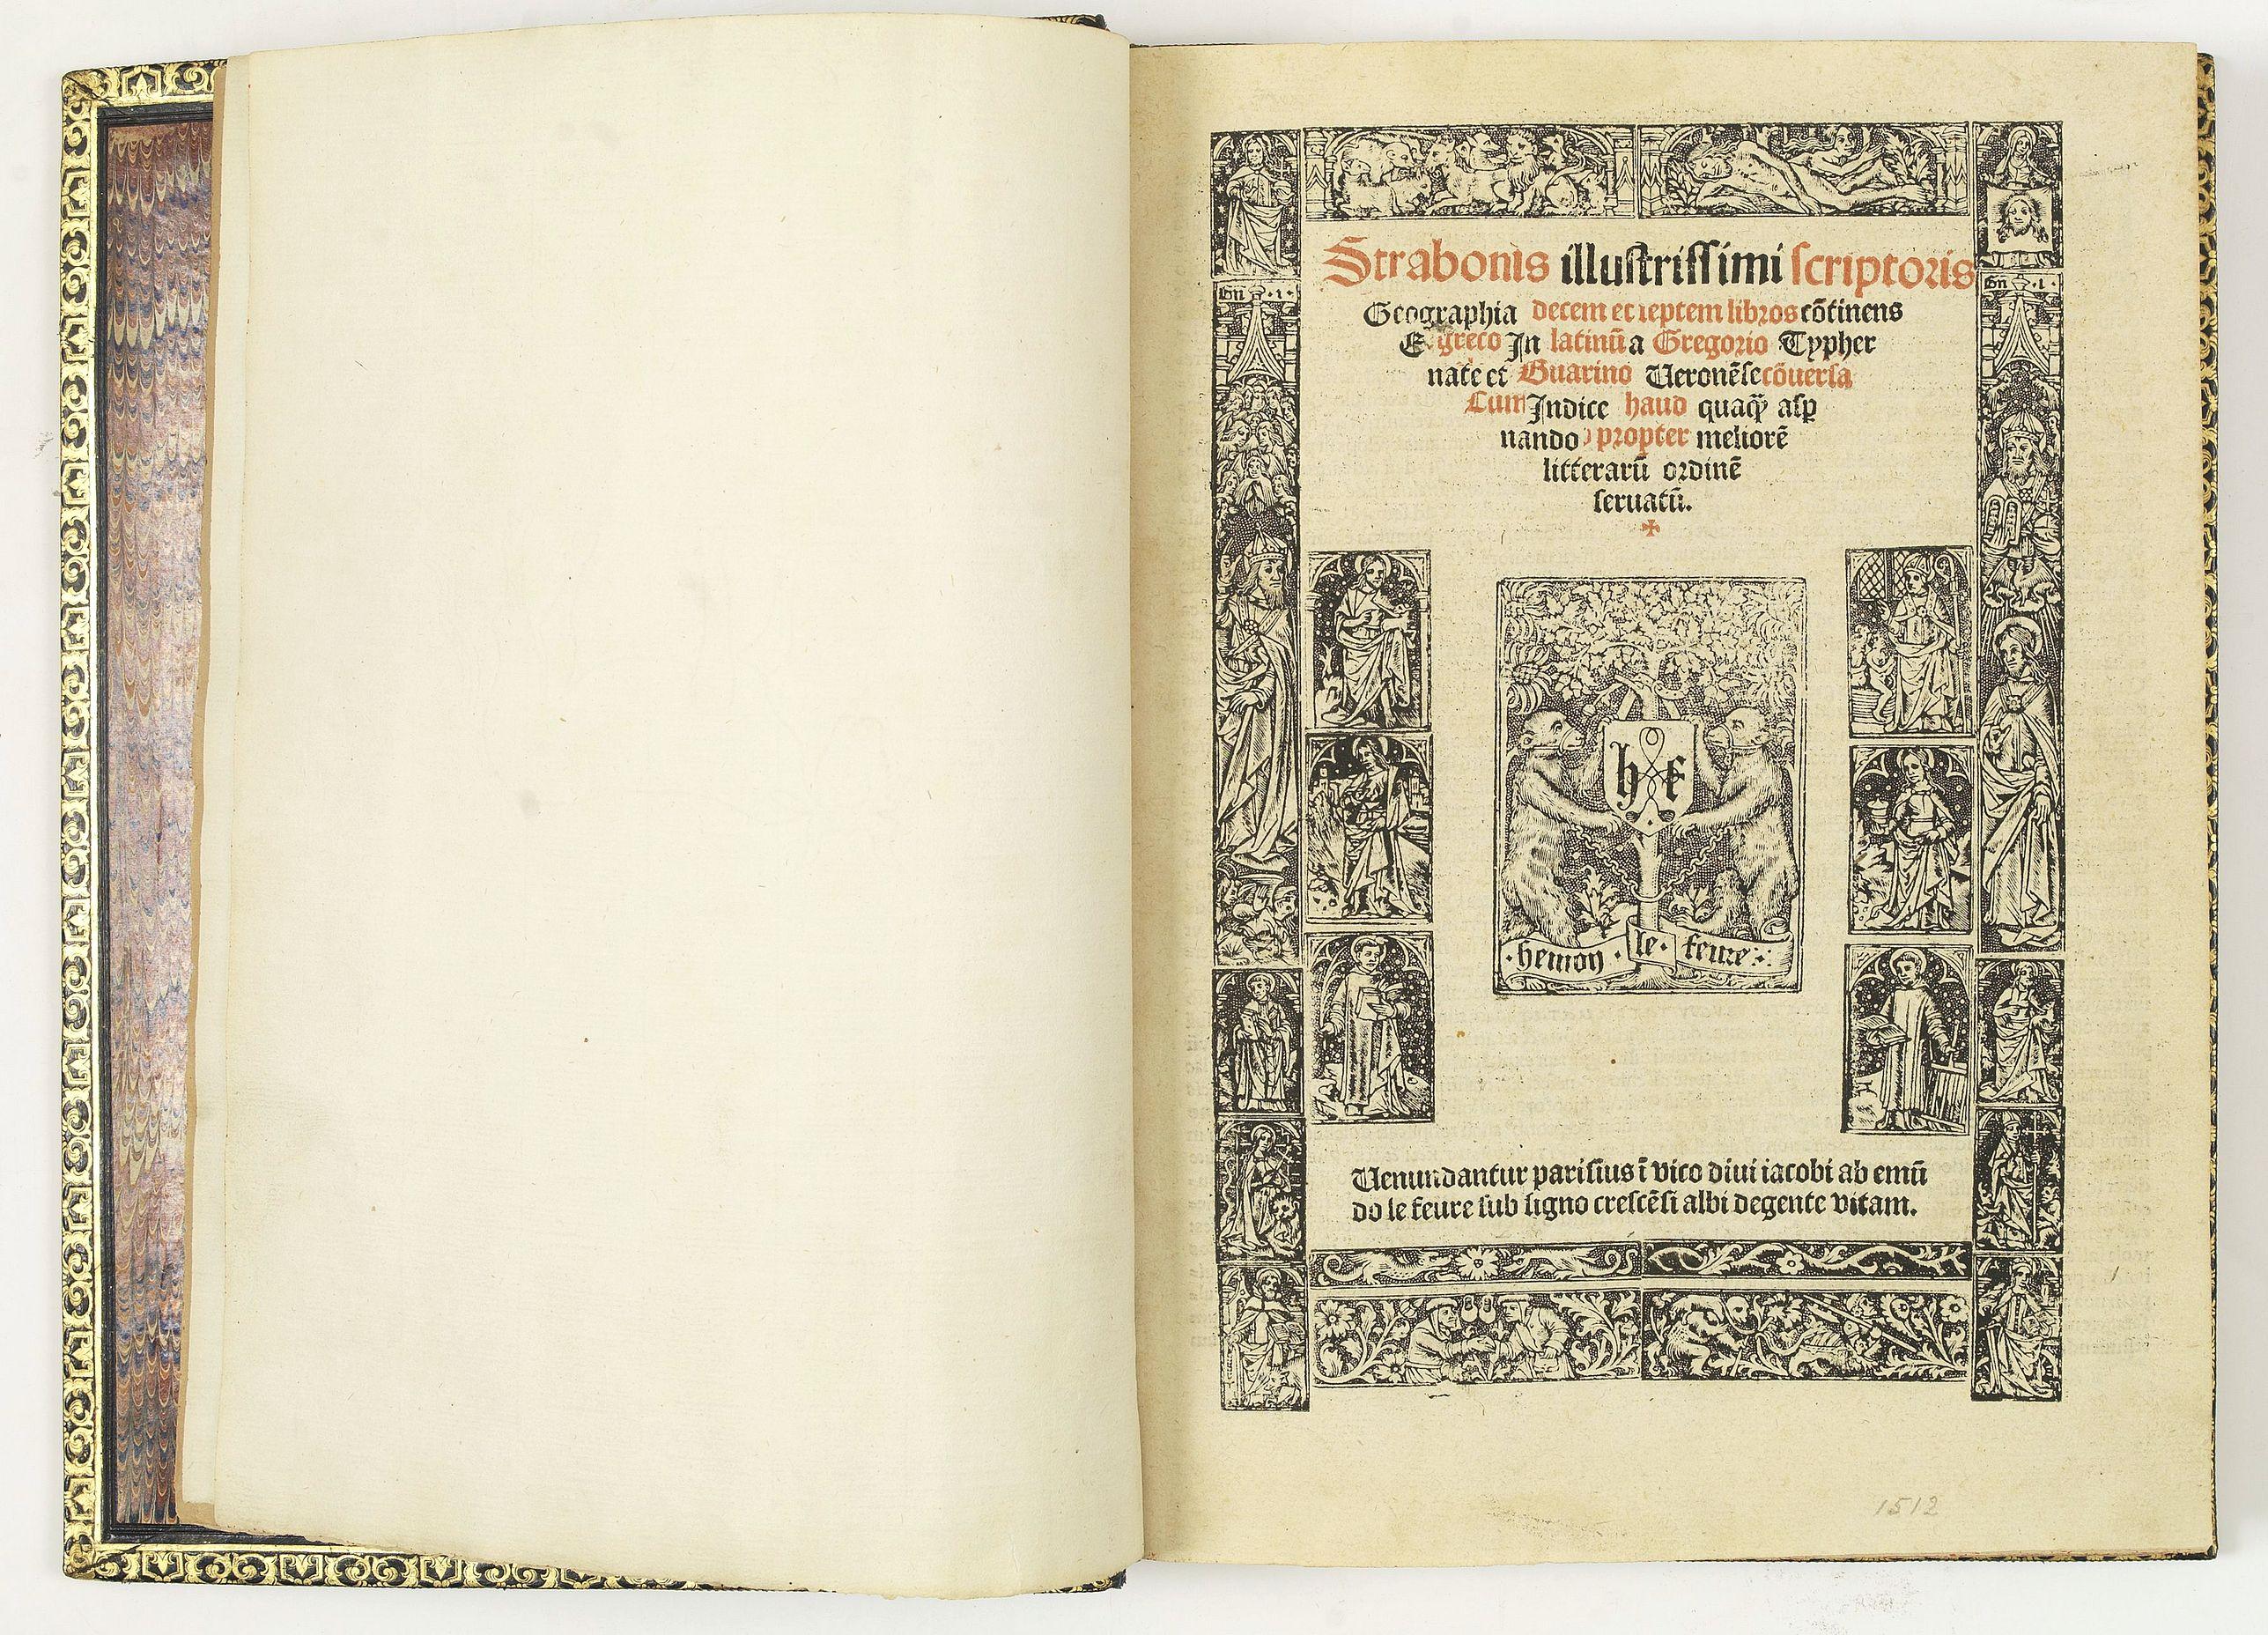 STRABO. -  Strabonis illustrissimi scriptoris Geographia decem et septem libros continens.